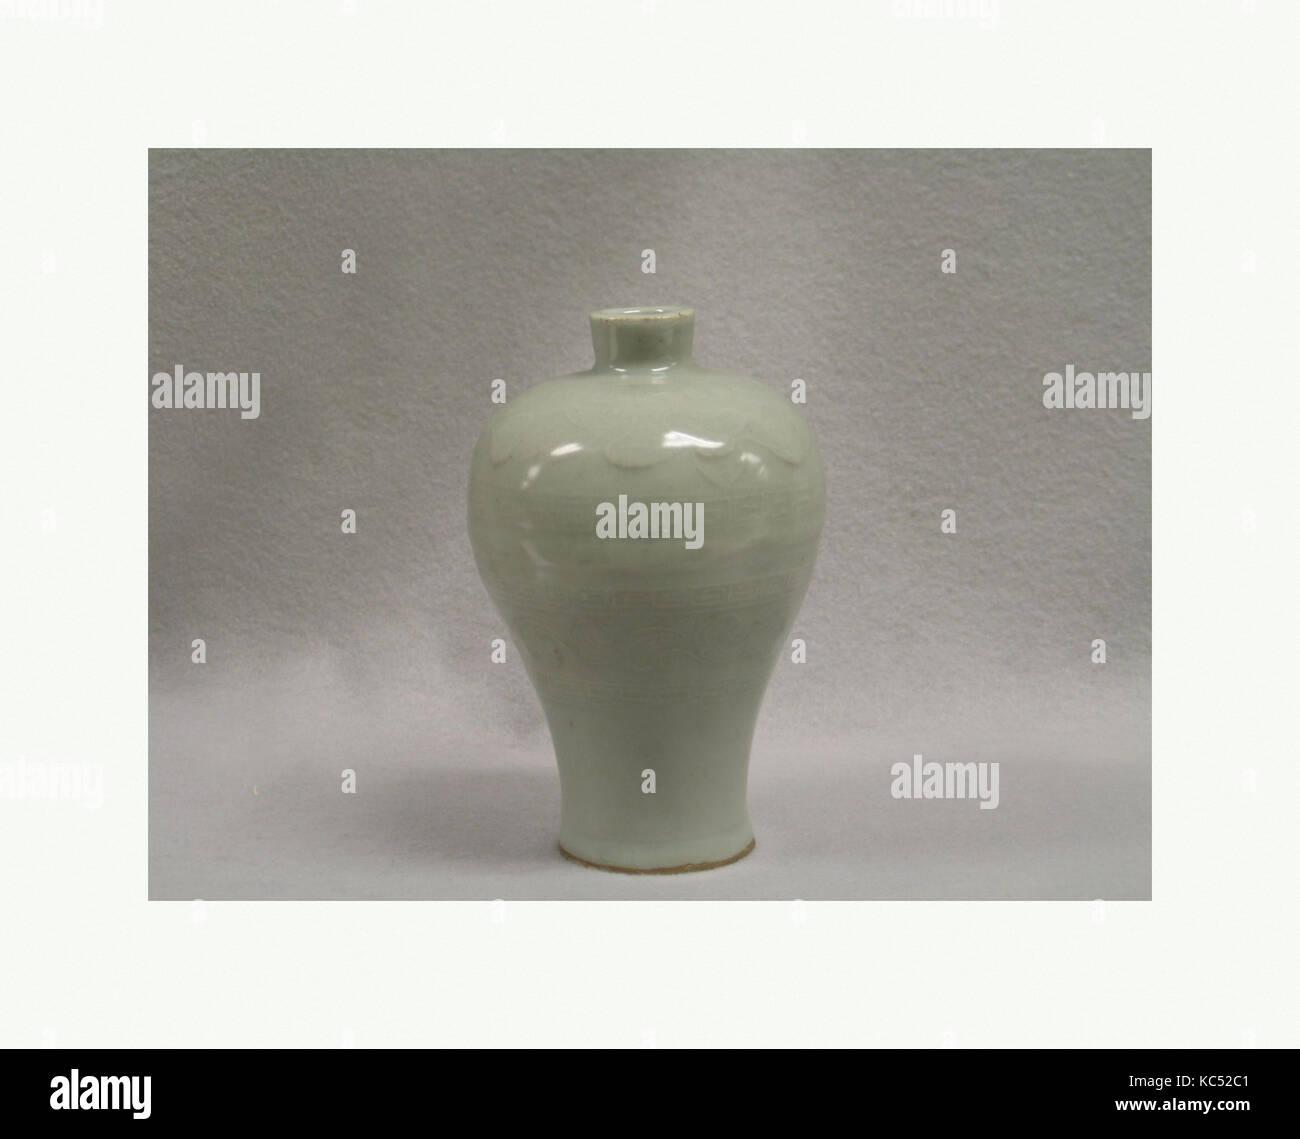 Ming dynasty vase stock photos ming dynasty vase stock images vase ming dynasty 13681644 china porcelain with celadon glaze reviewsmspy